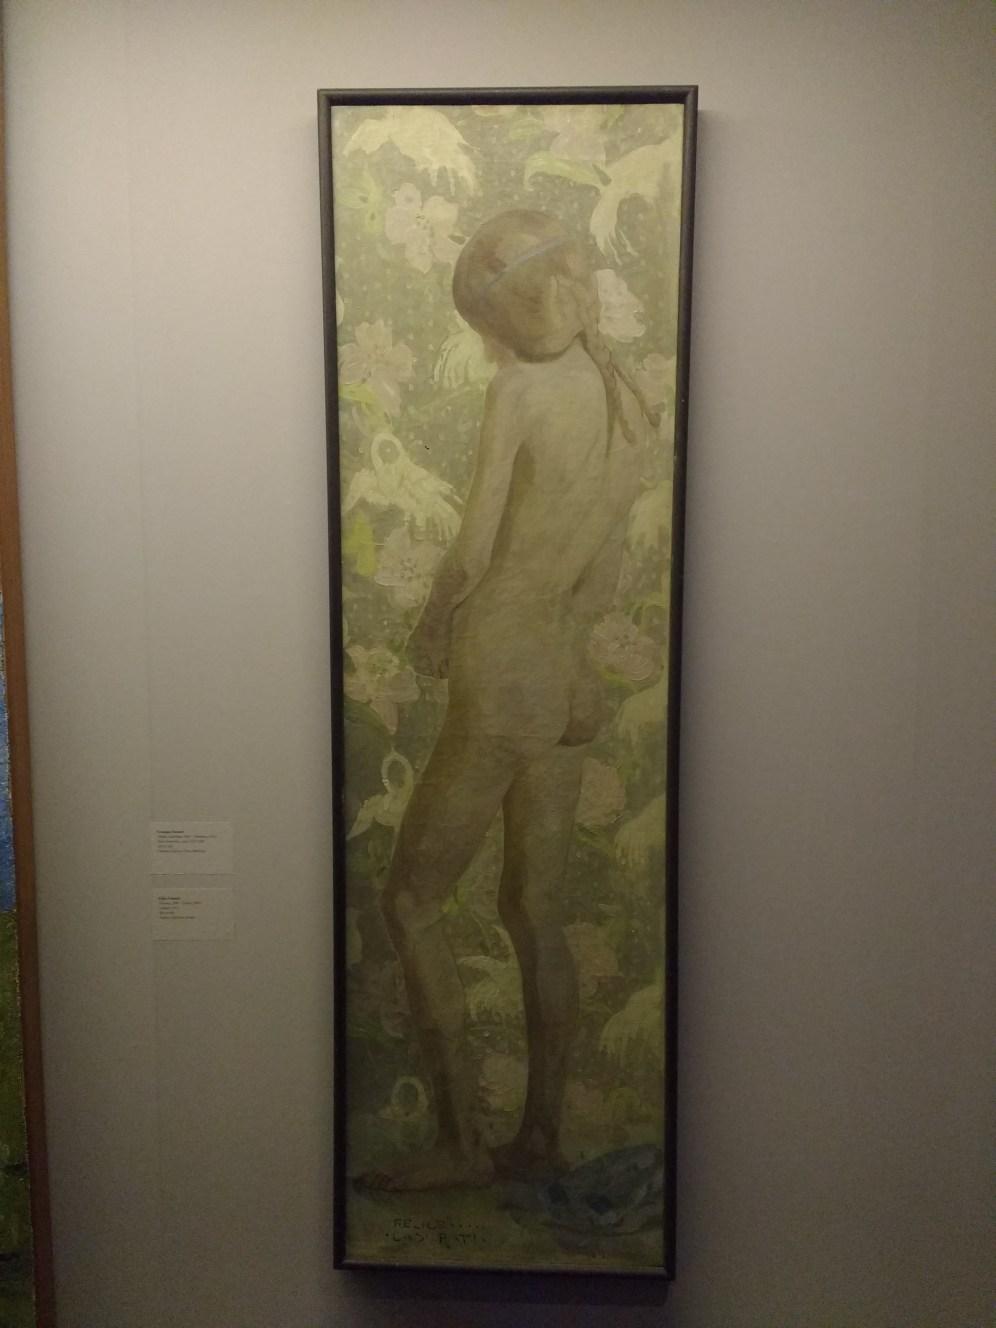 Felice Casorati, Nudo femminile